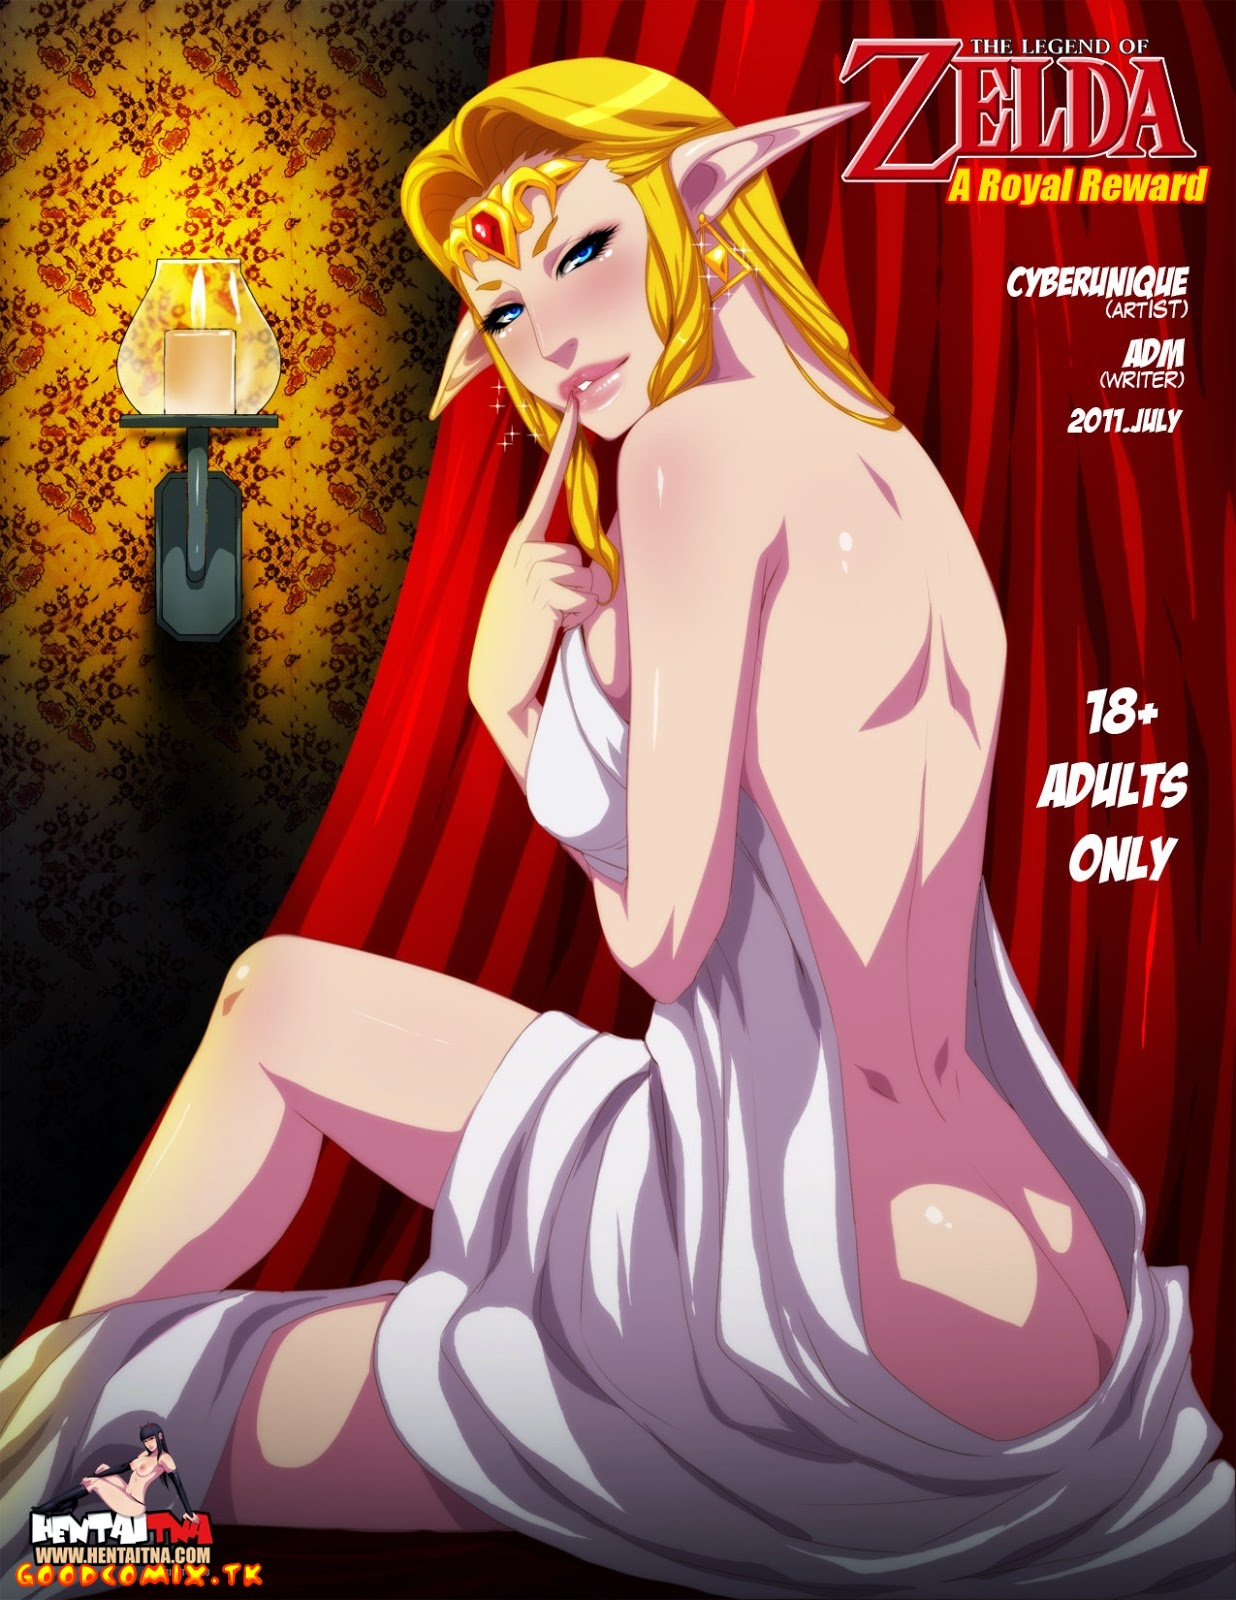 Goodcomix The Legend of Zelda - [HentaiTNA] - A Royal Reward